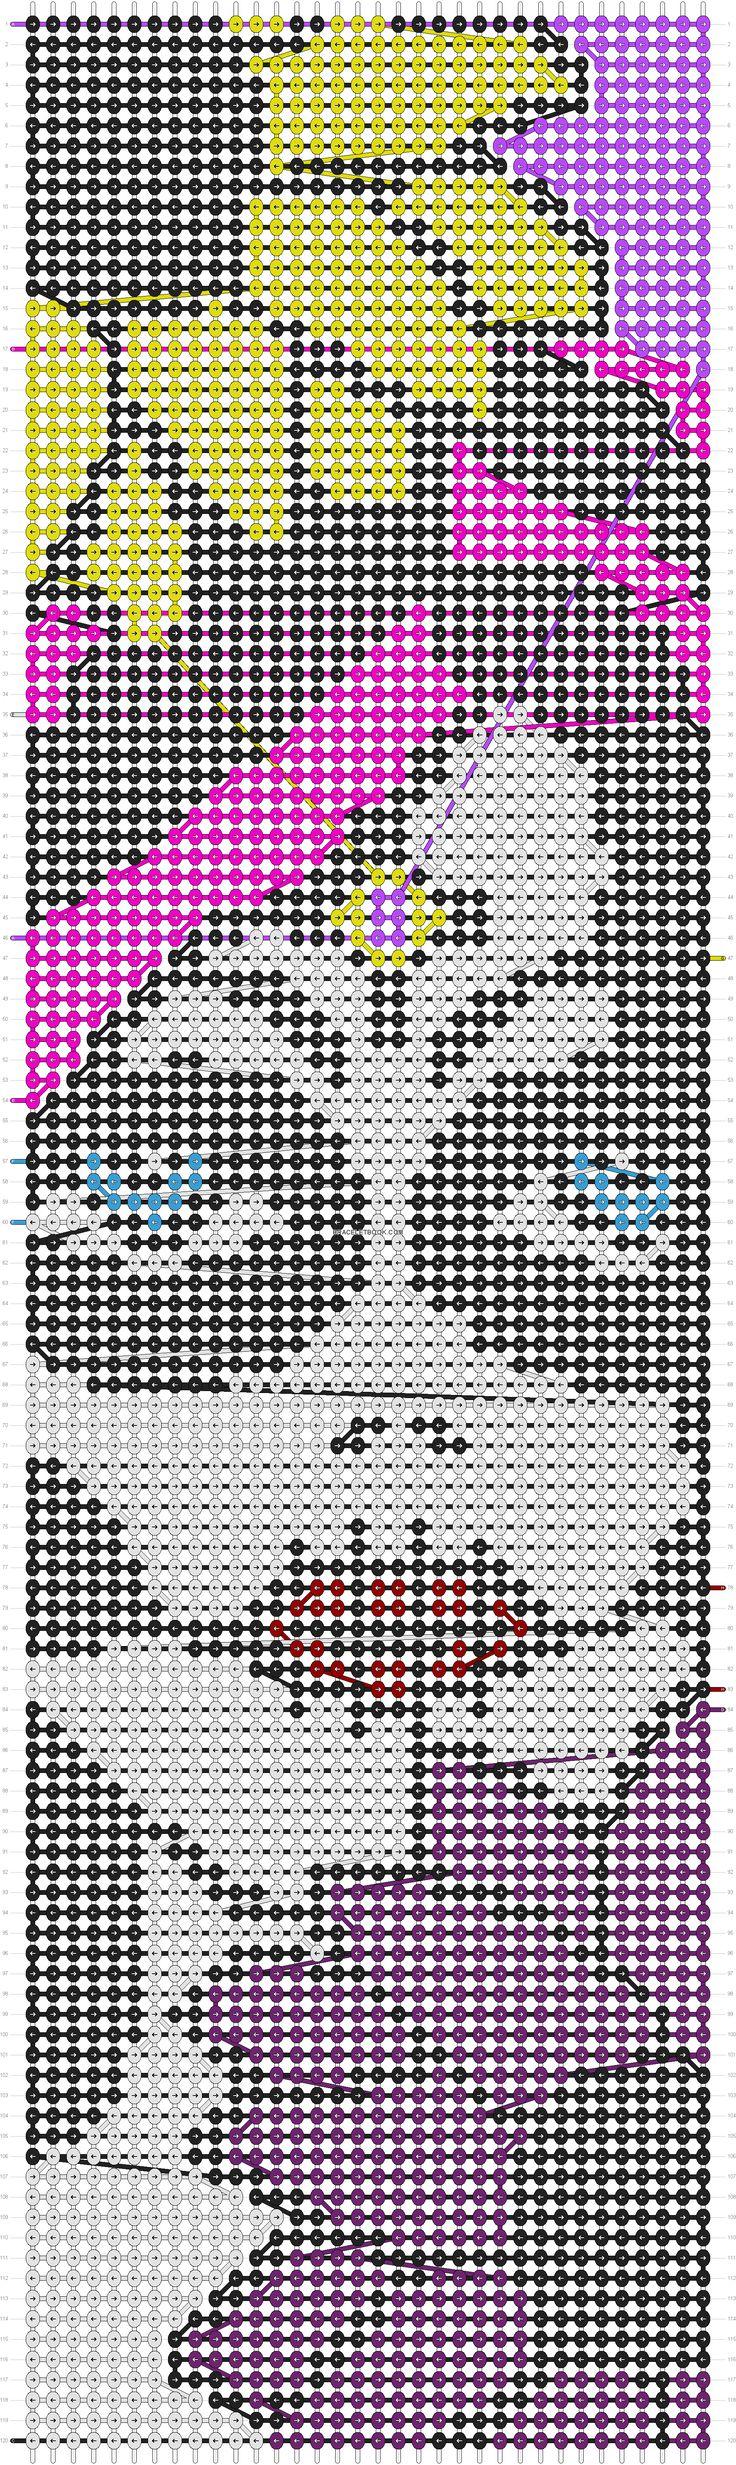 Alpha Pattern #17466 added by qwazy2